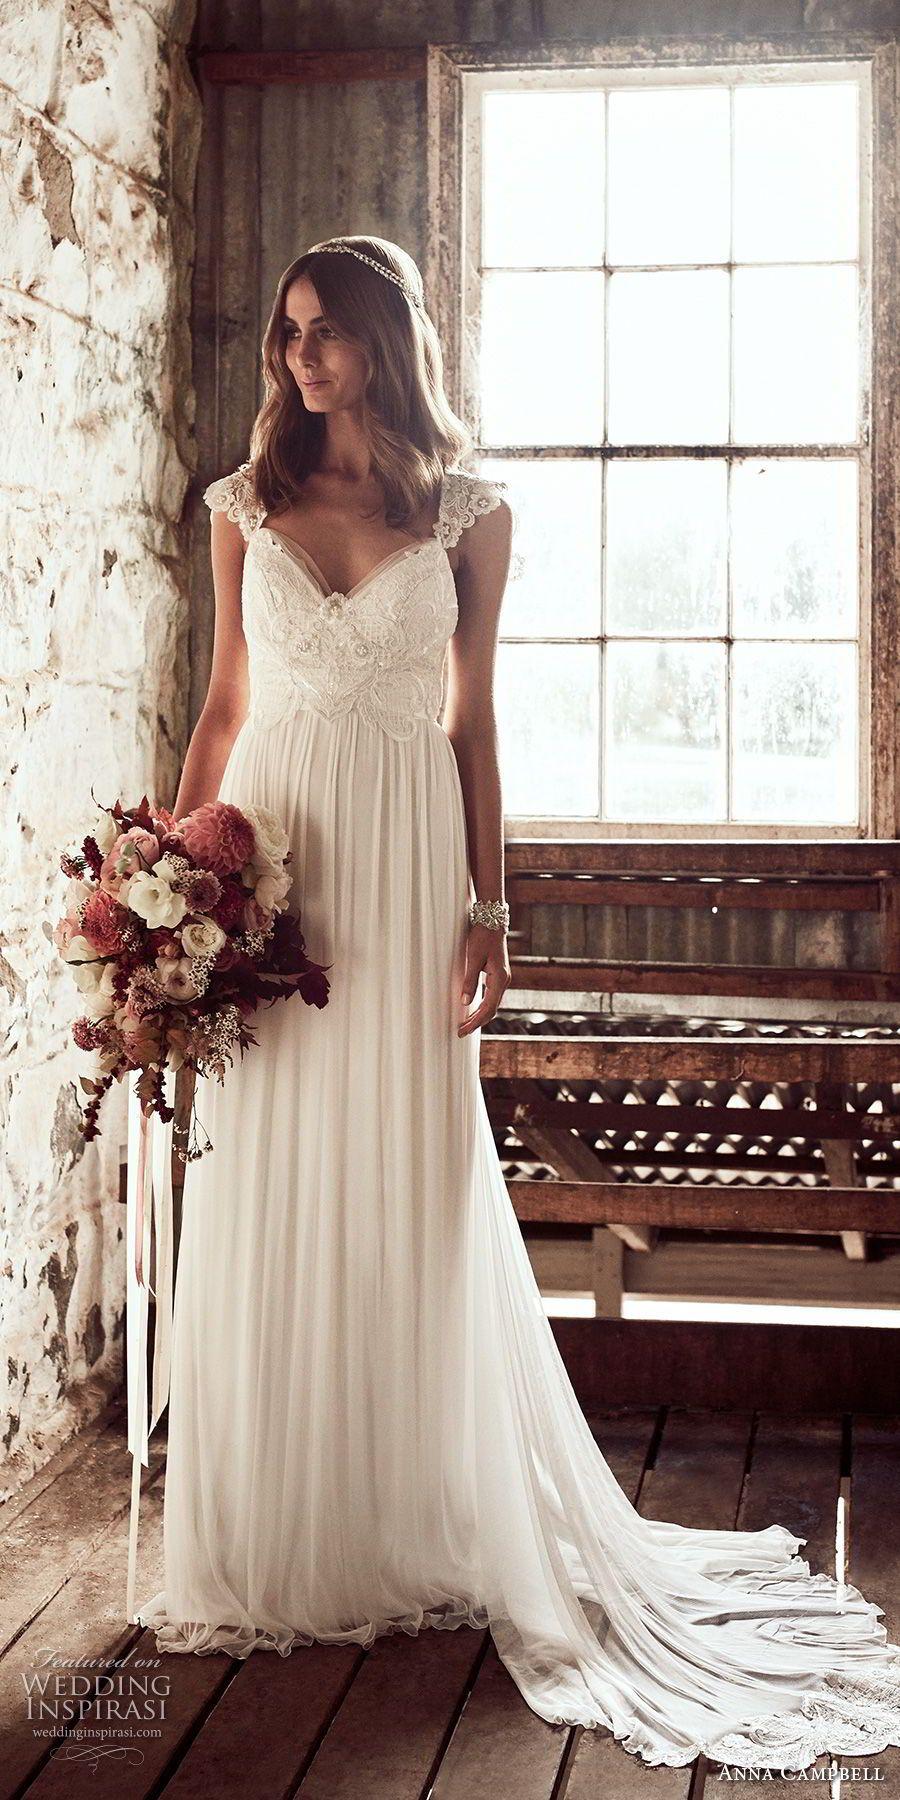 Anna campbell wedding dresses u uceternal heartud bridal